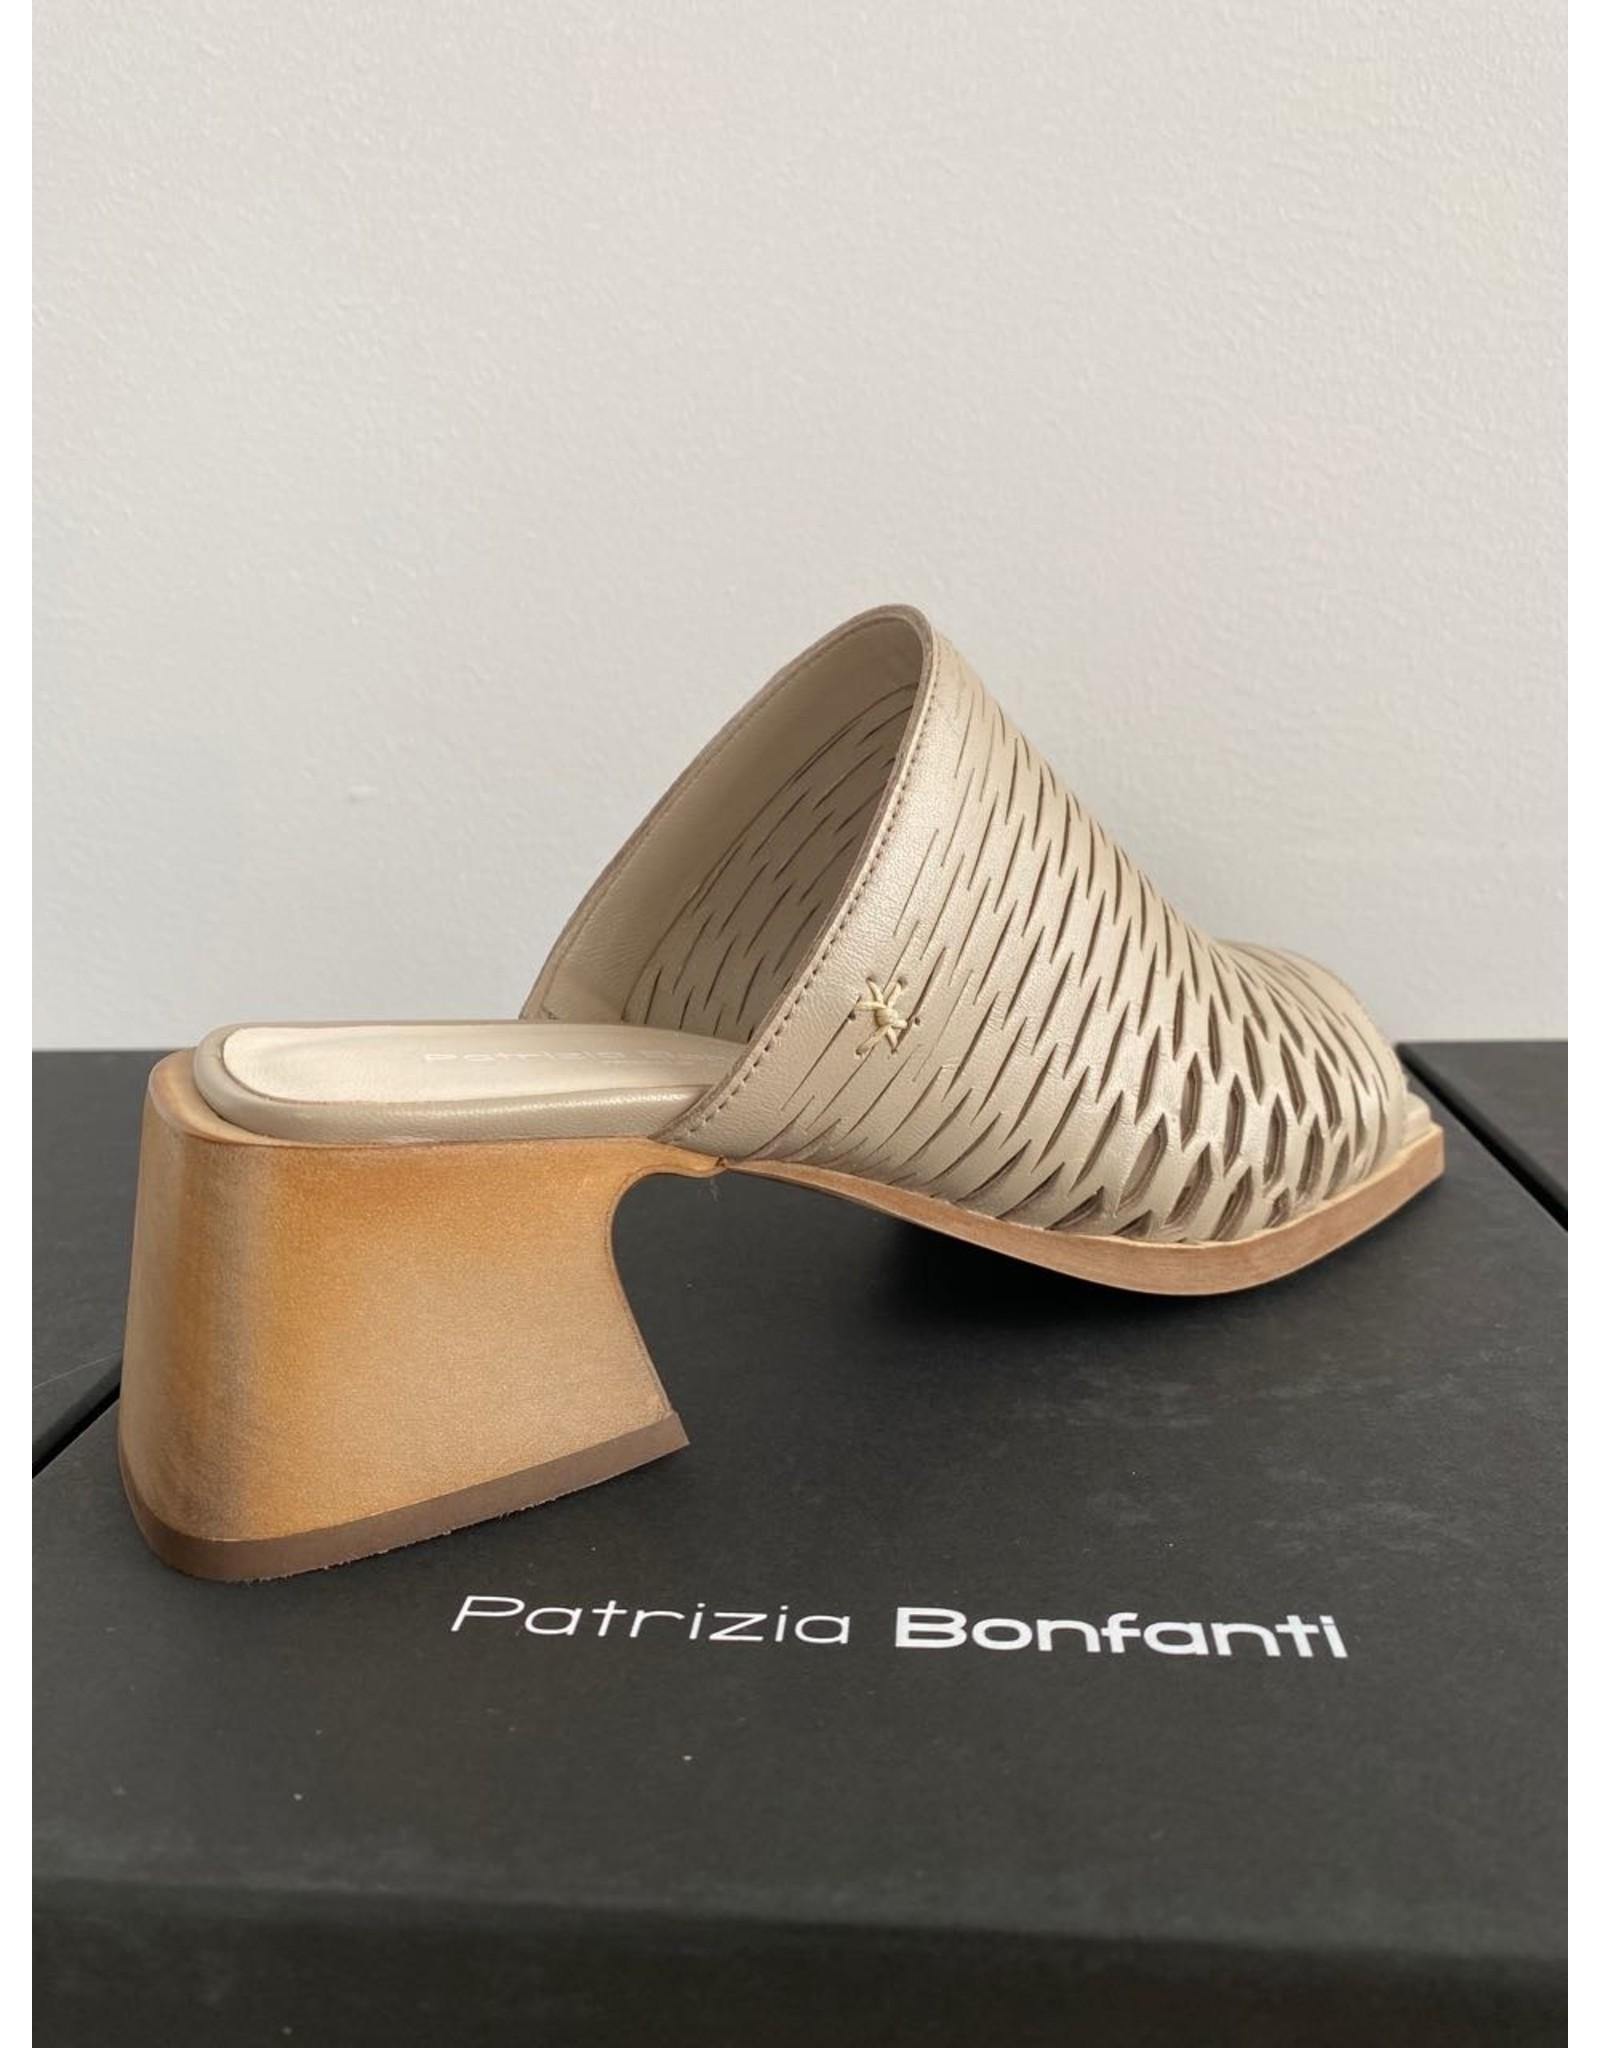 Patrizia Bonfanti Peep Toe Architectural Heel Sandal